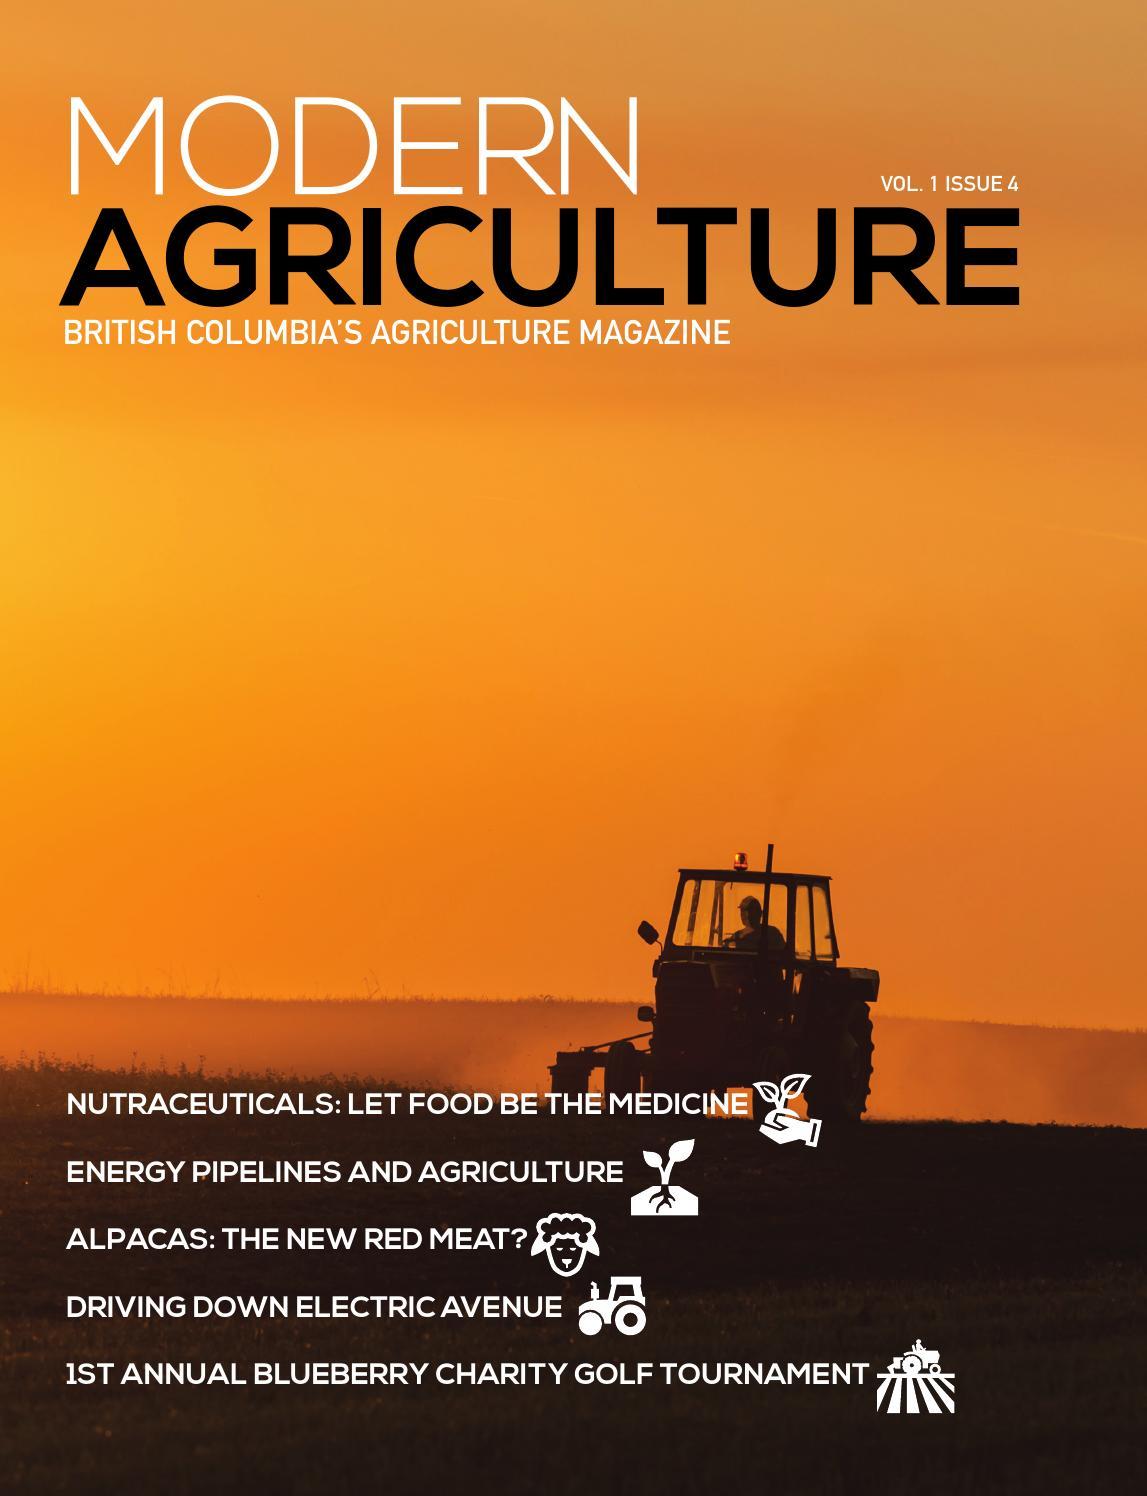 Modern Agriculture Magazine Volume 1 Issue 4 By Modern